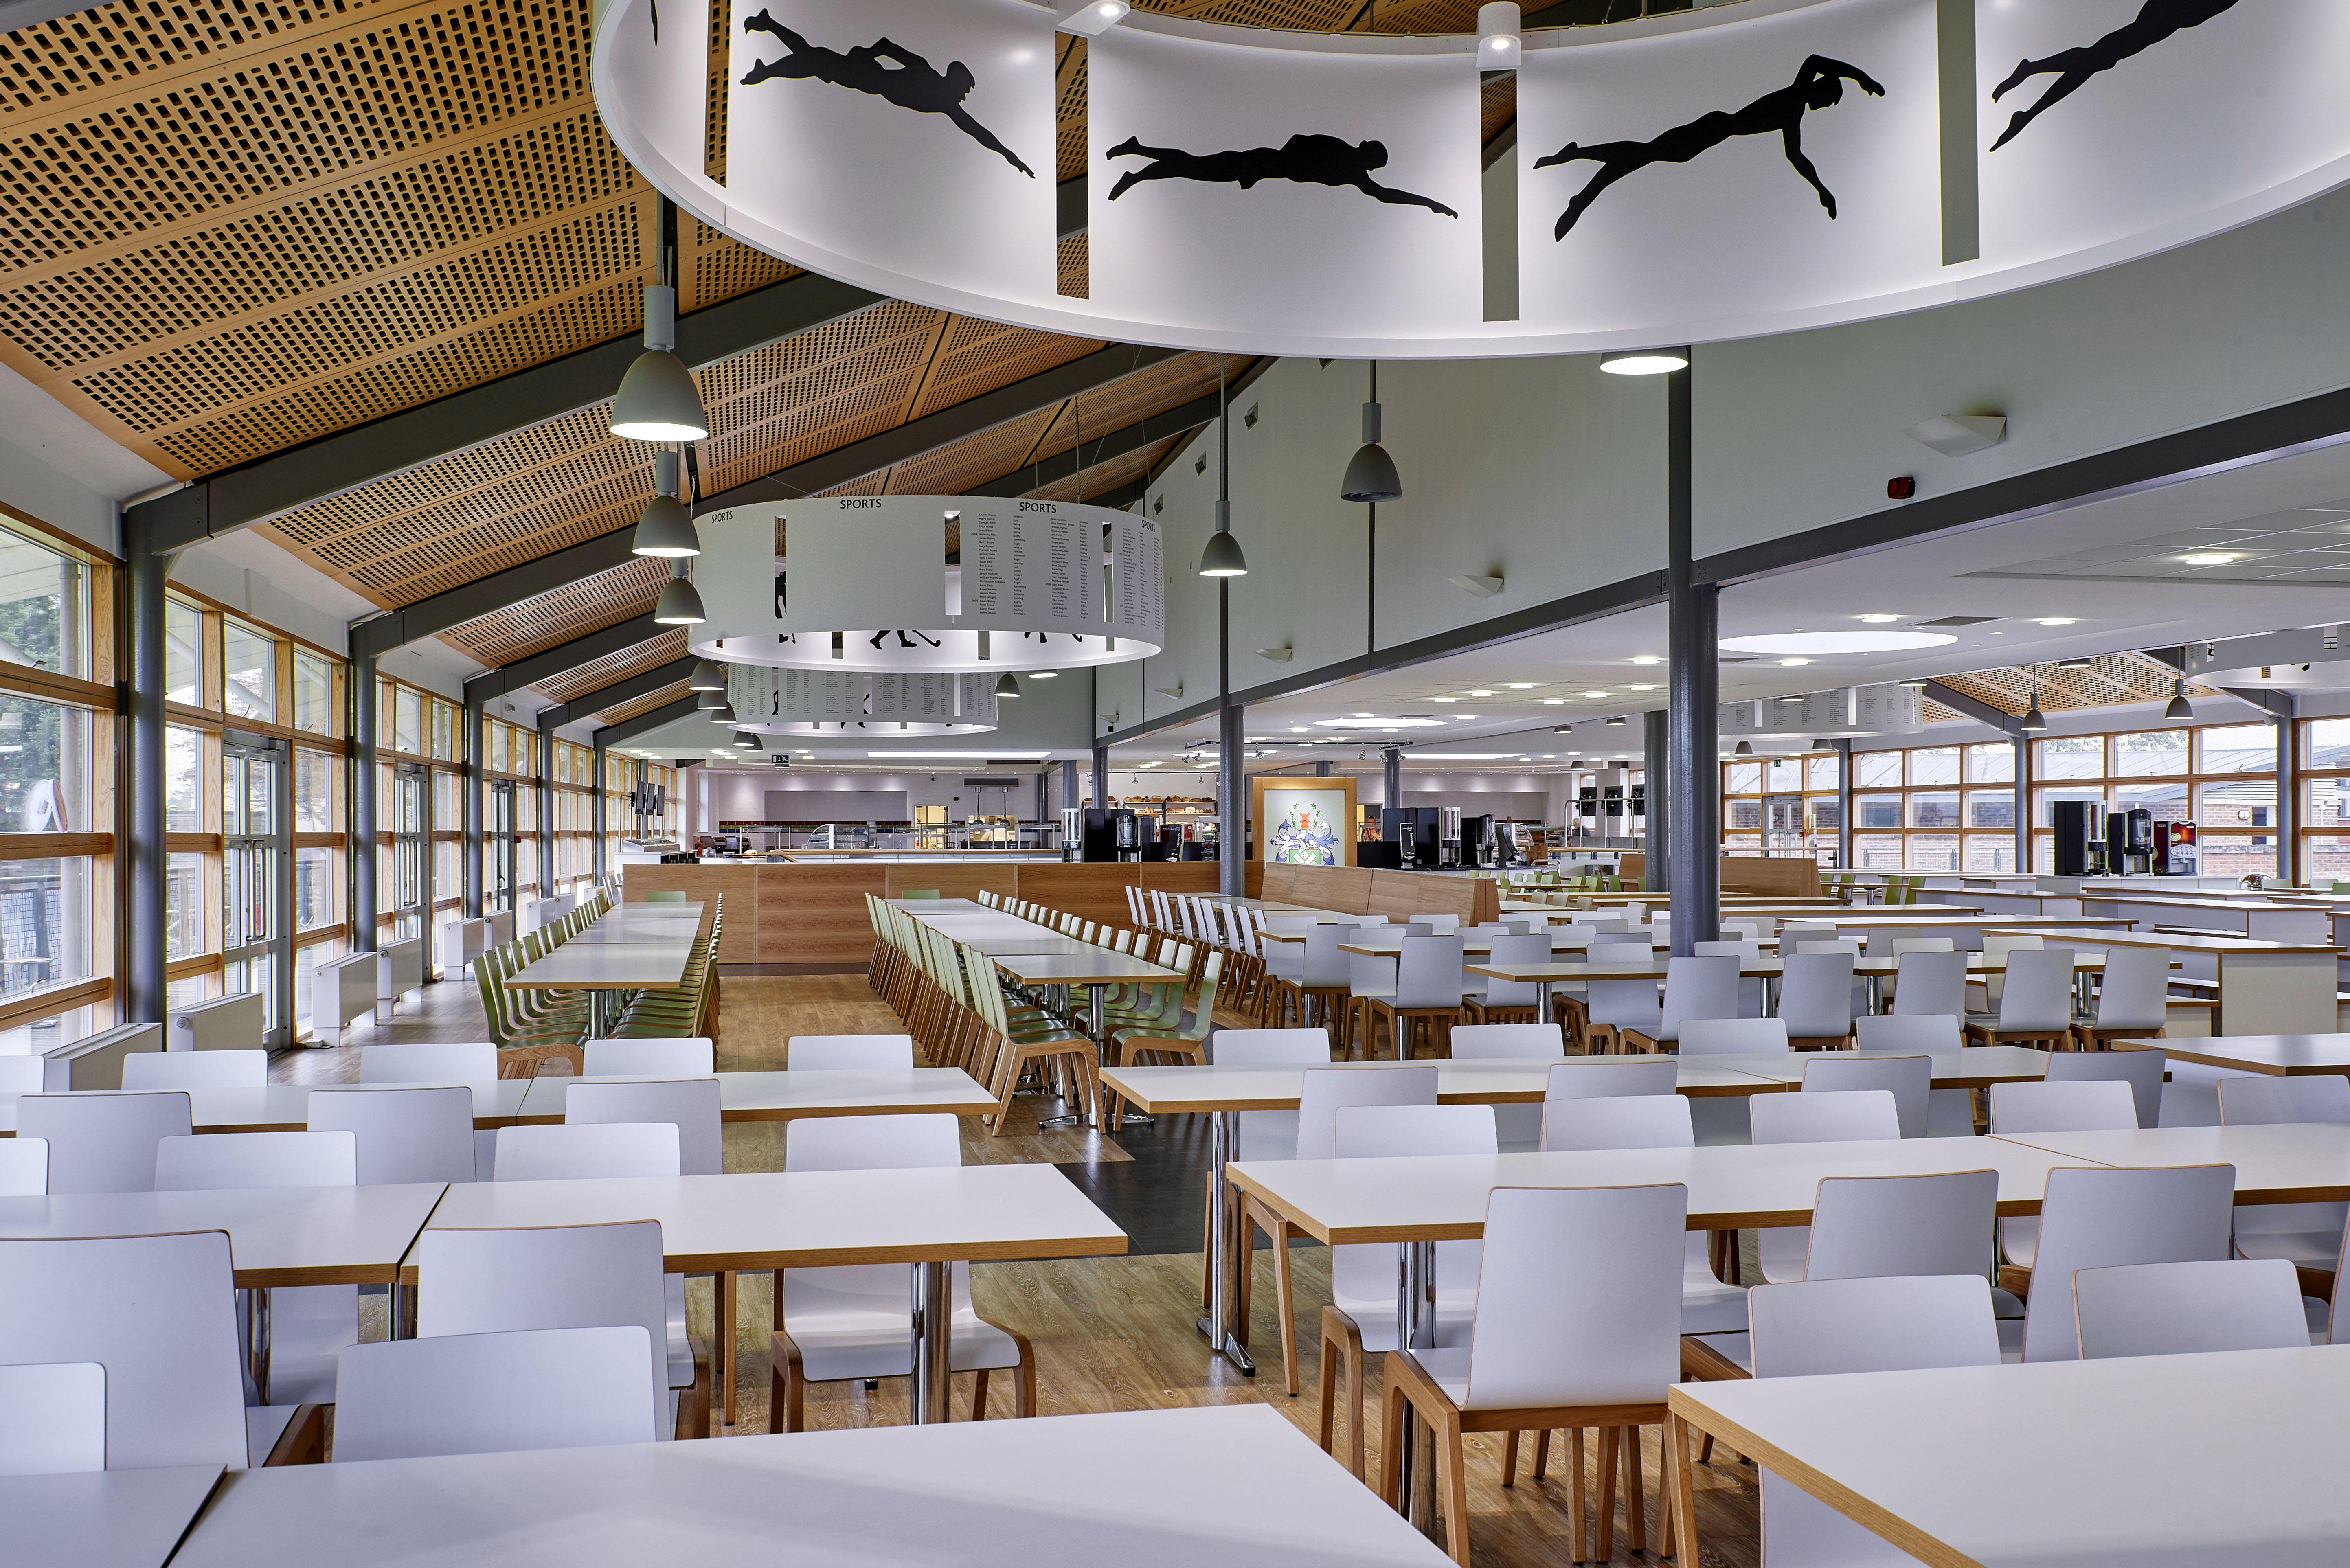 decor courses interior top online fresh design idea classes of line decorating inspirational